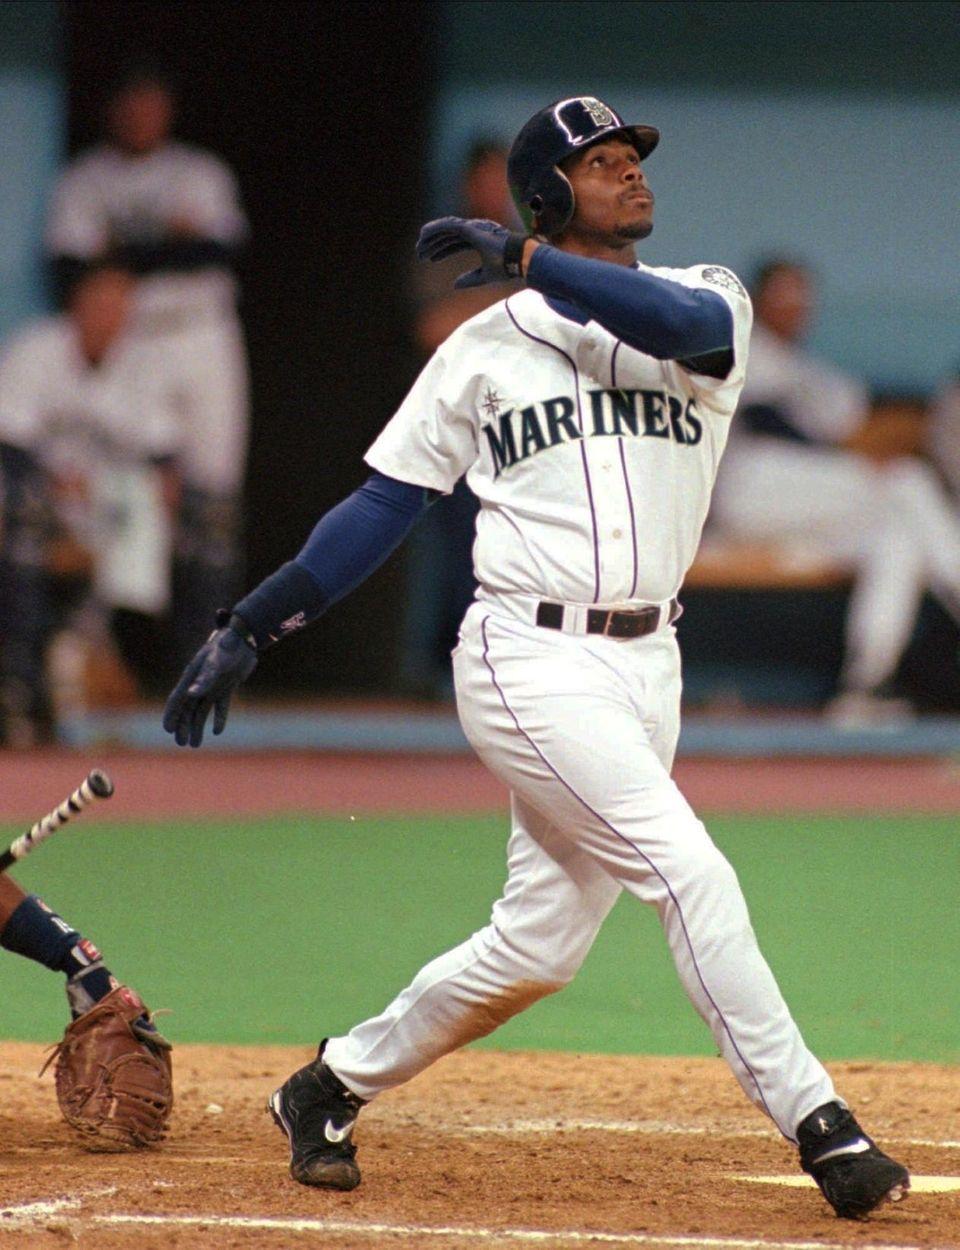 KEN GRIFFEY JR. 1998, Seattle Mariners 56 home